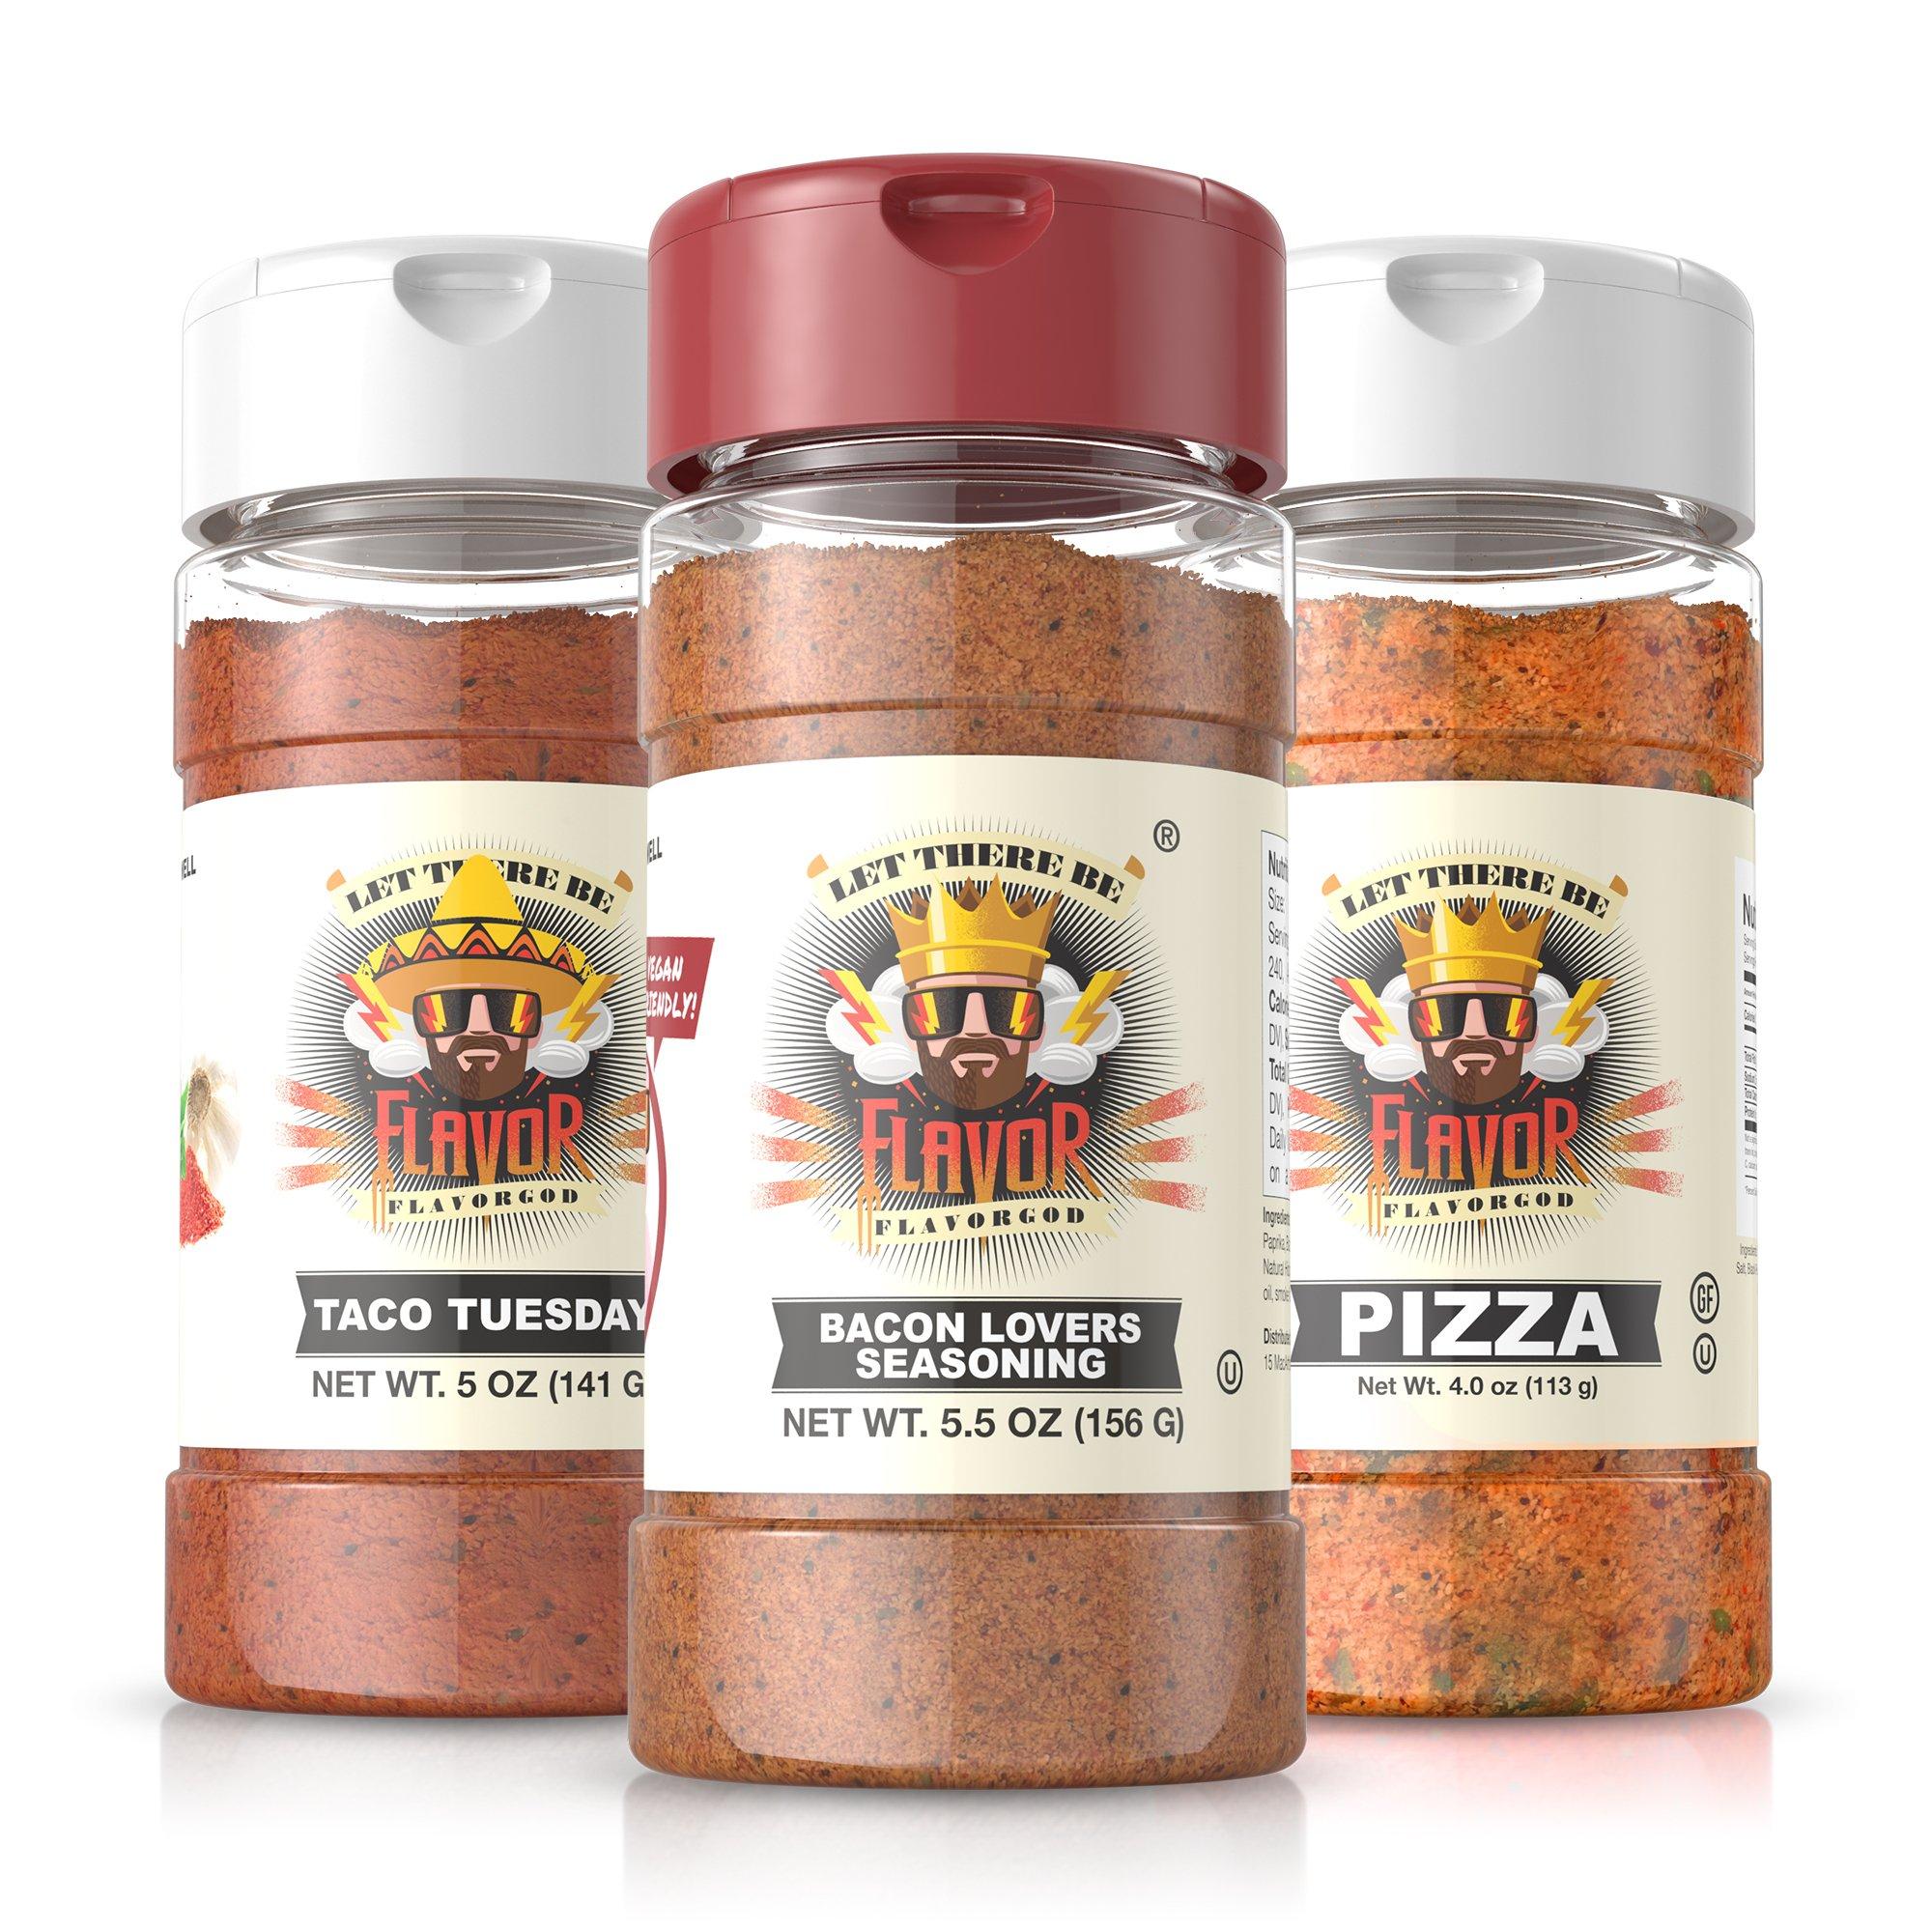 #1 Best-Selling 5oz. Flavor God Seasonings - Gluten Free, Low Sodium, Paleo, Vegan, No MSG (Vegan Lovers, 3 Bottles)